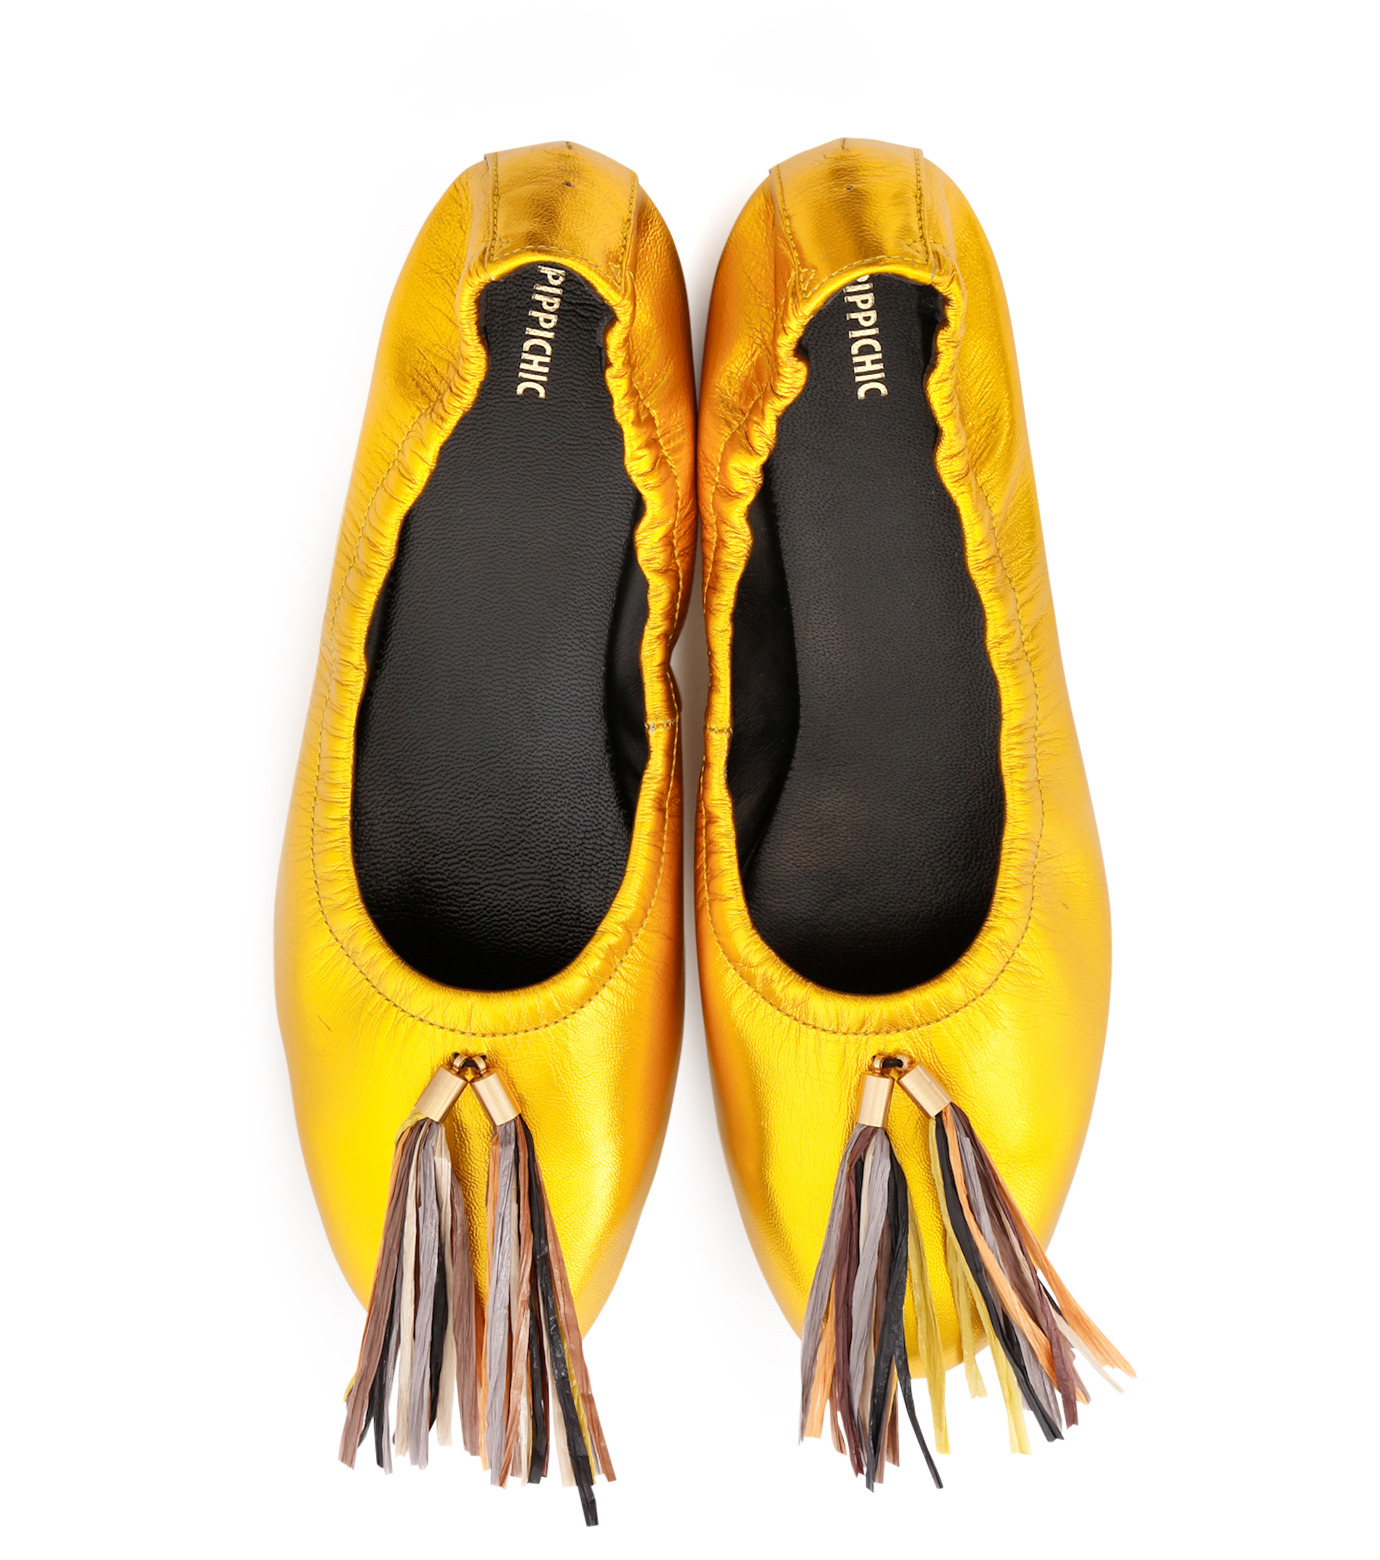 PIPPICHIC(ピッピシック)のballet shoes-GOLD(シューズ/shoes)-PP16BALLET19-2 拡大詳細画像4